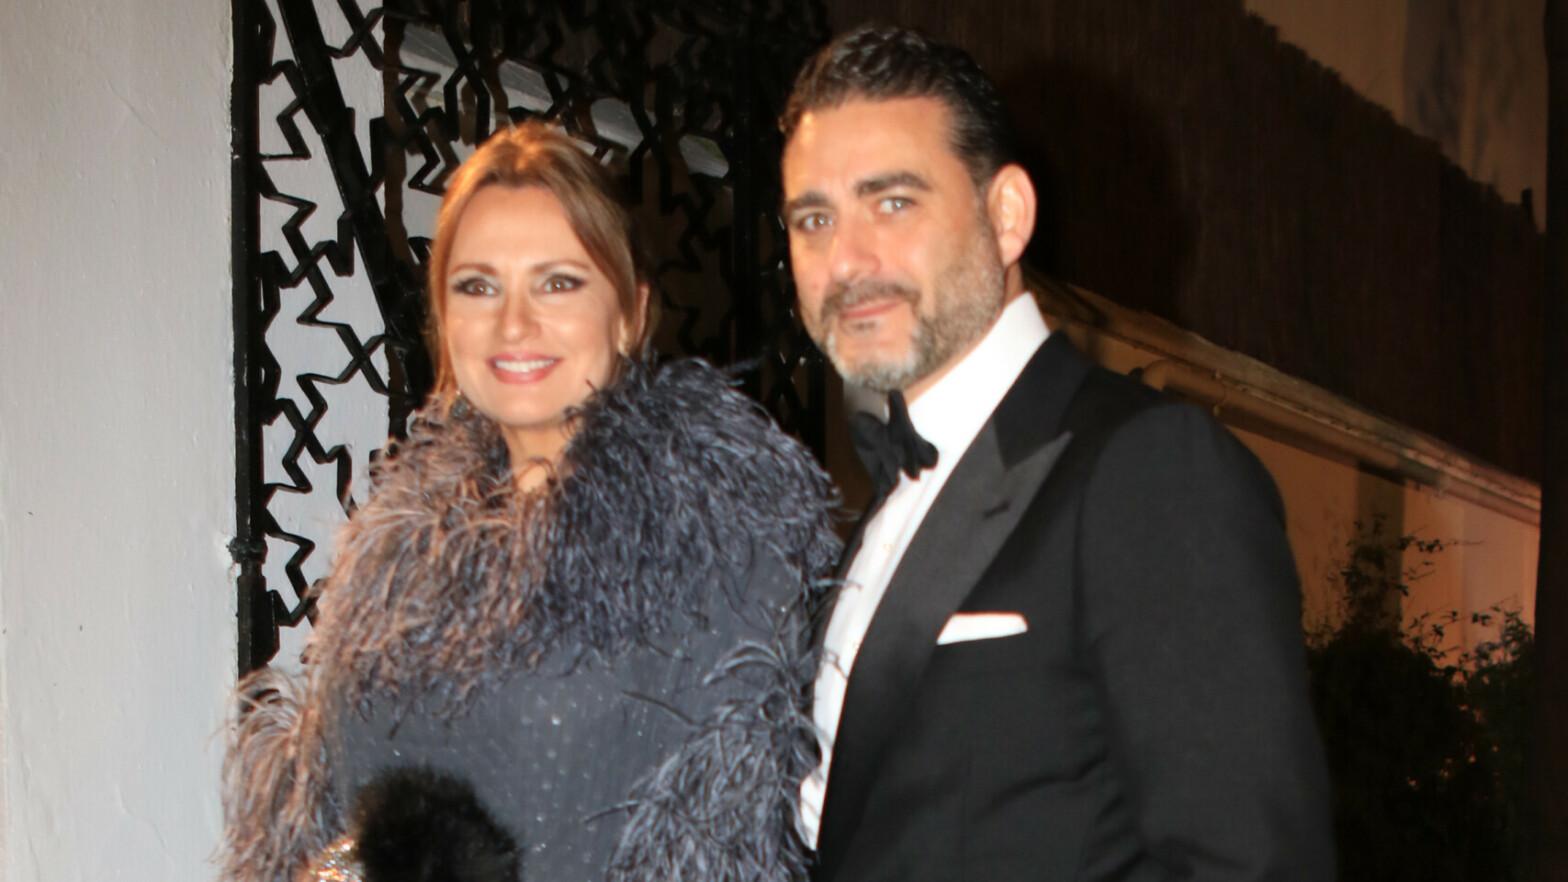 Ainhoa Arteta separates from her fourth husband Matías Urrea